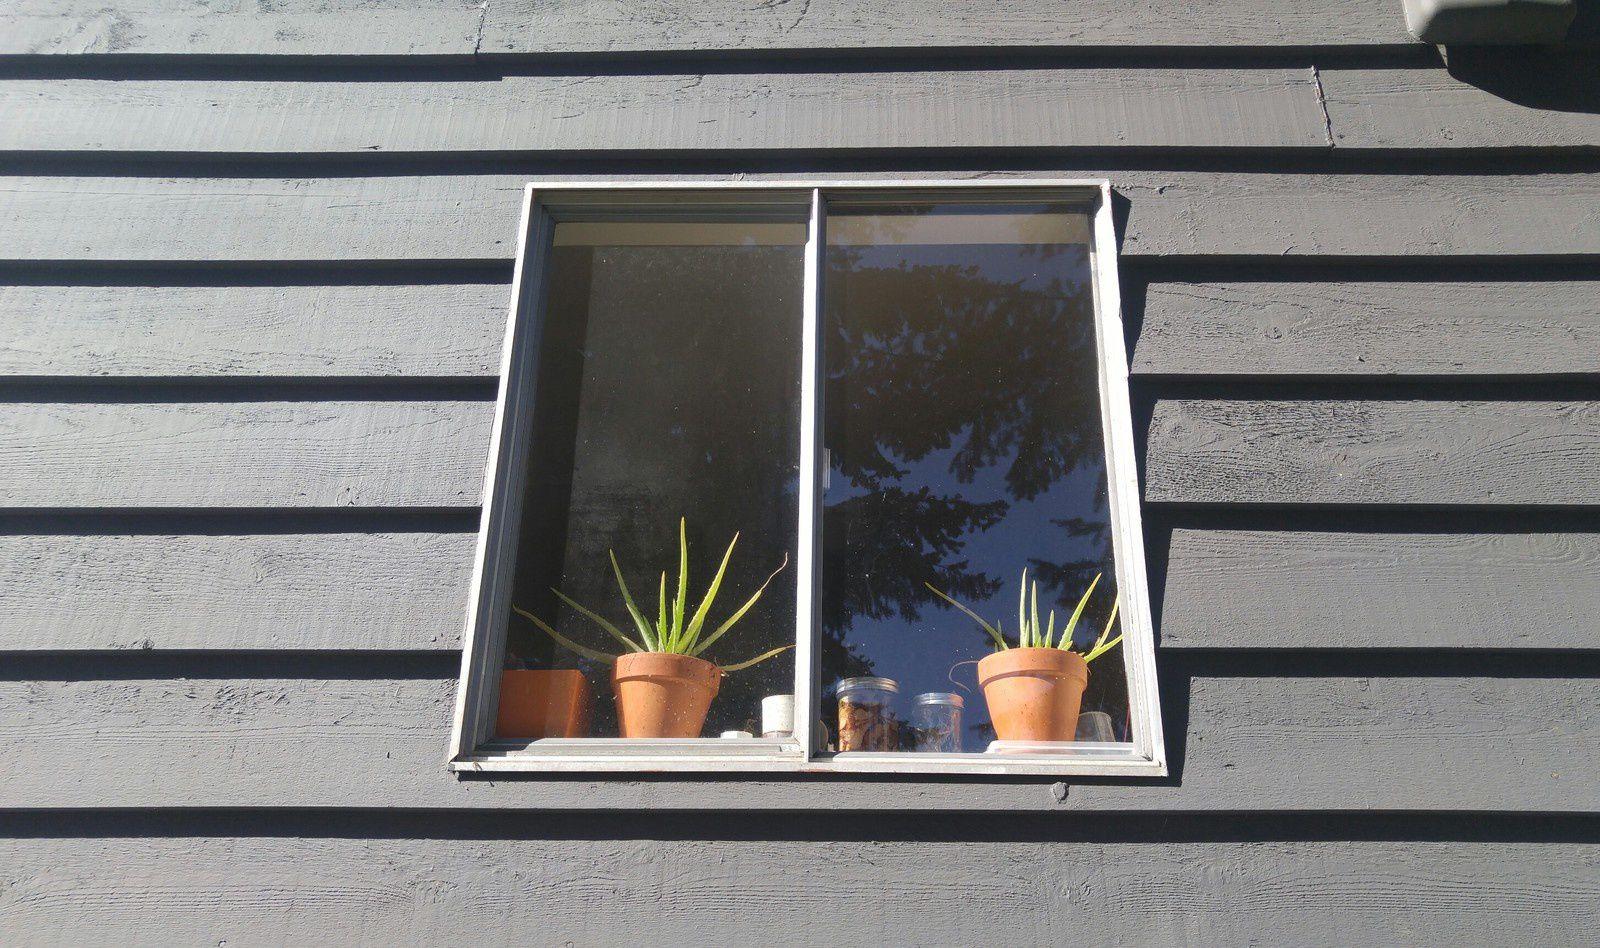 Living Room Window From Outside - April, 21st 2017 © Anne Errelis-Phillips